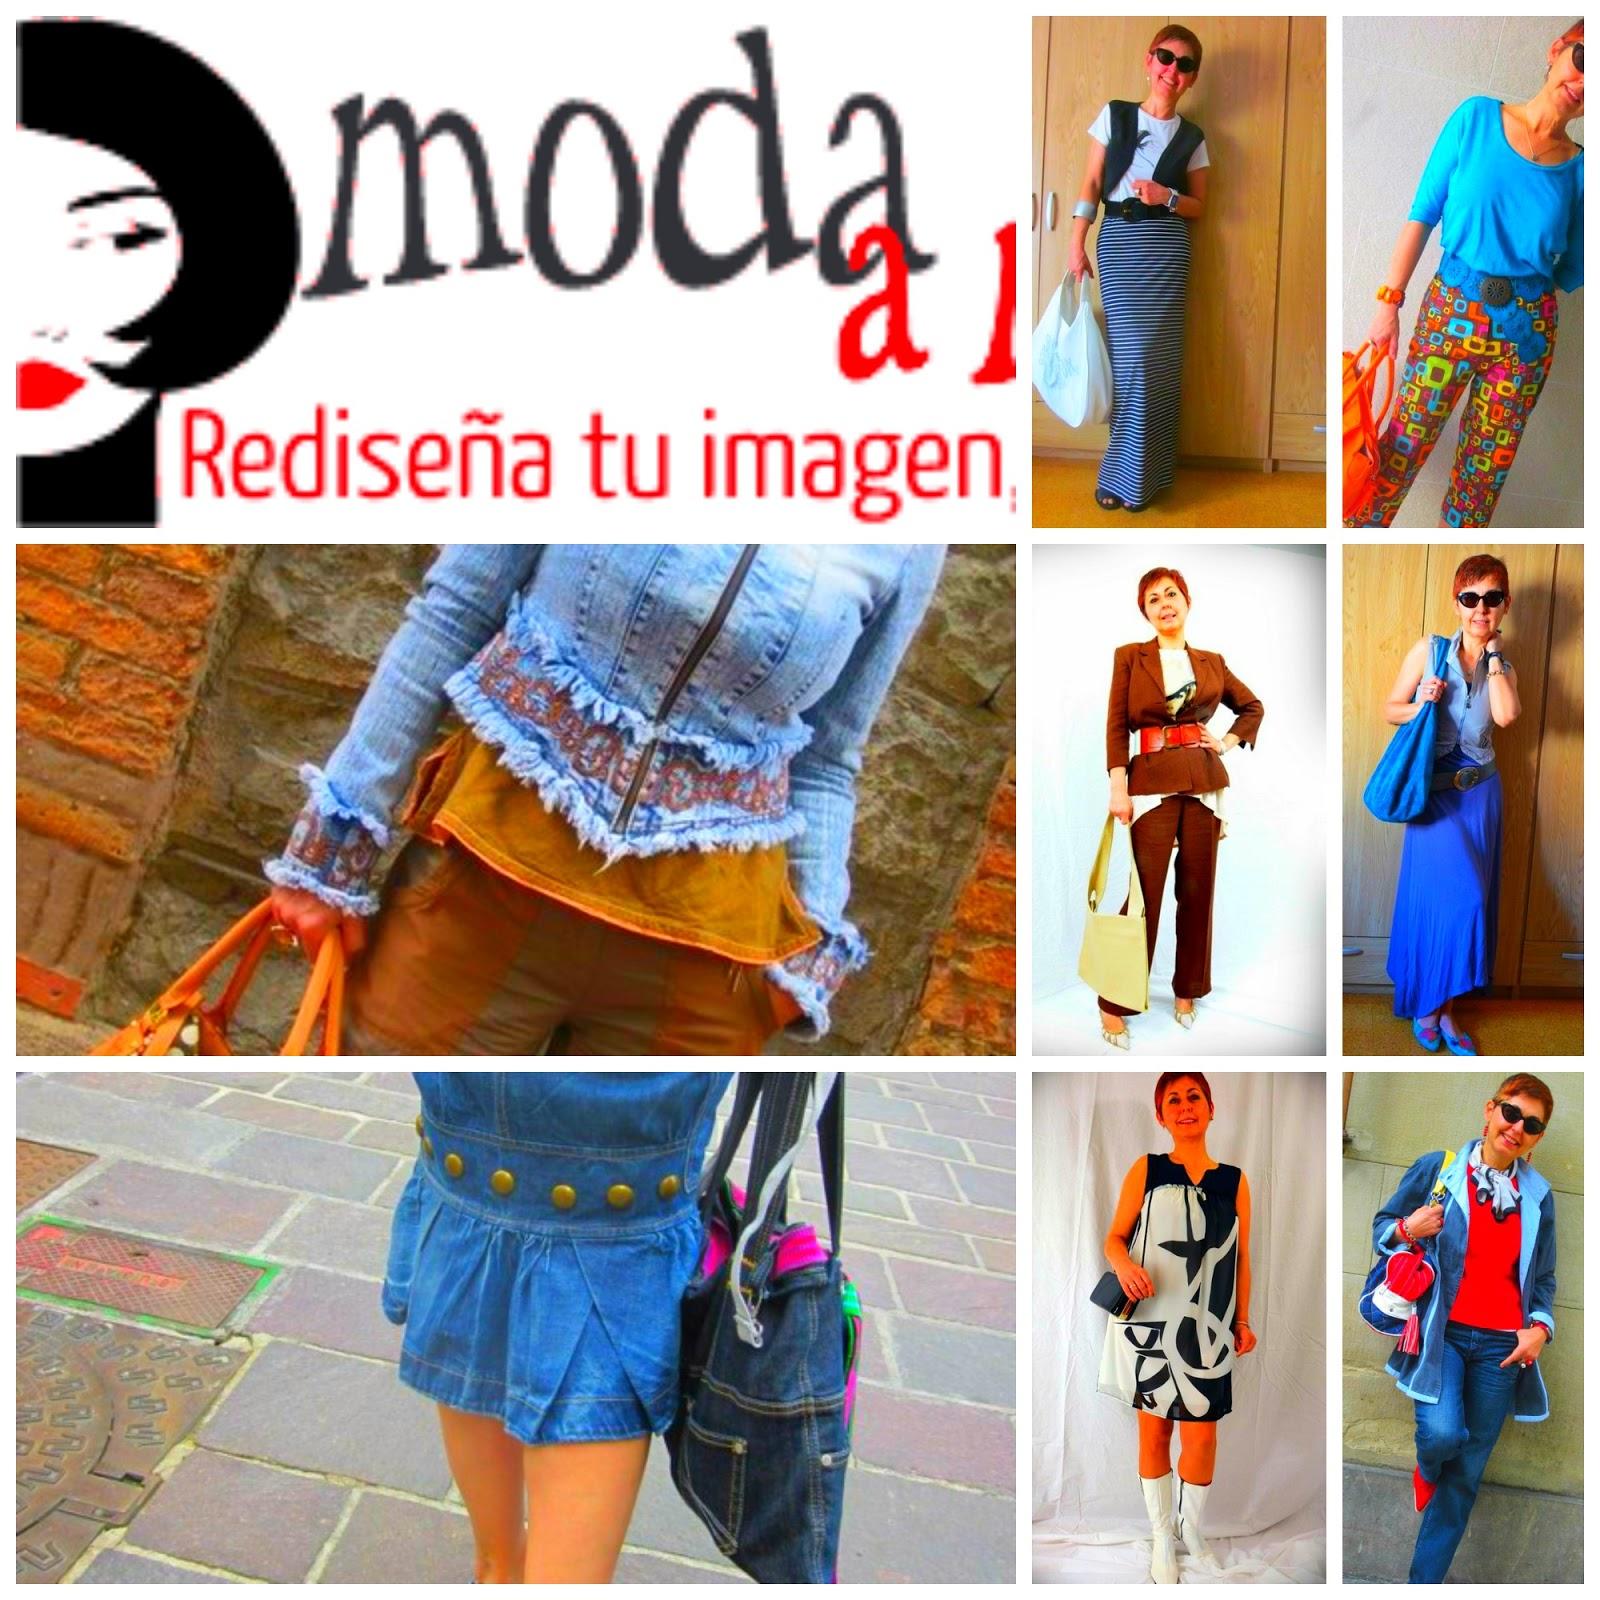 moda, bricomoda, estilismo, diseño, patronaje, trucos, looks